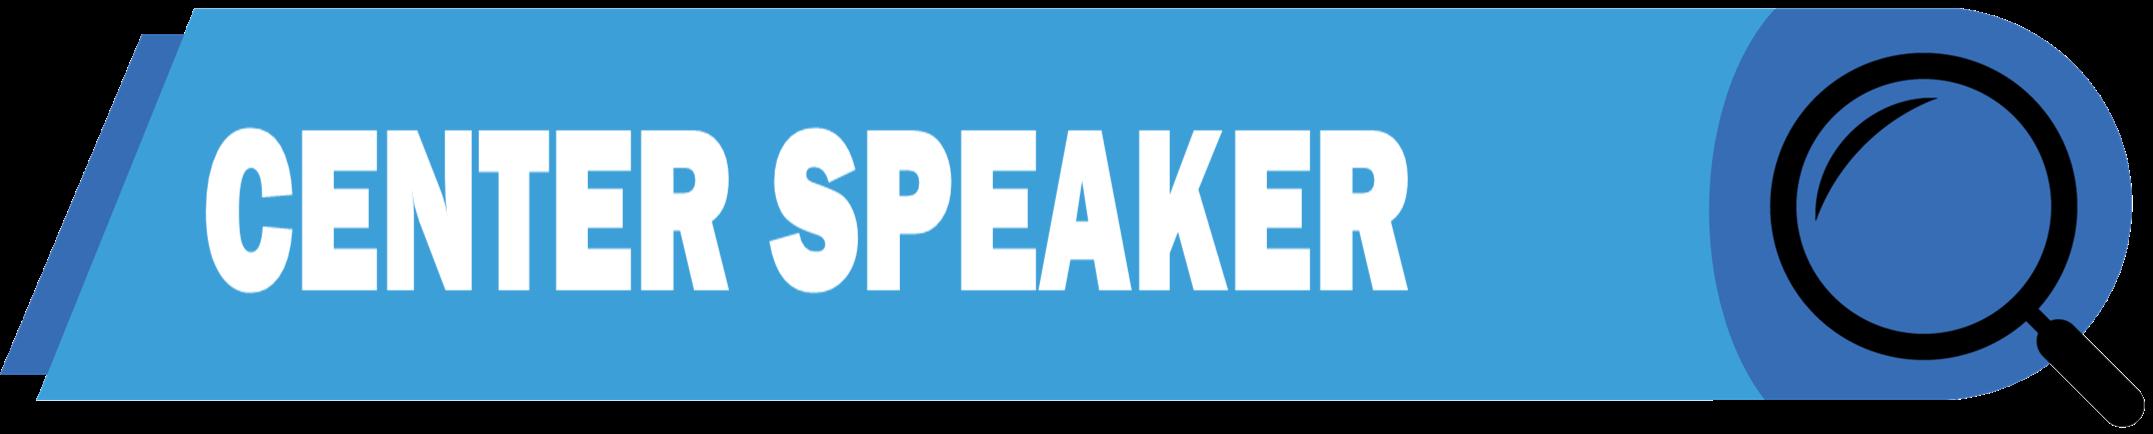 centre-speaker-click-bar-a.png